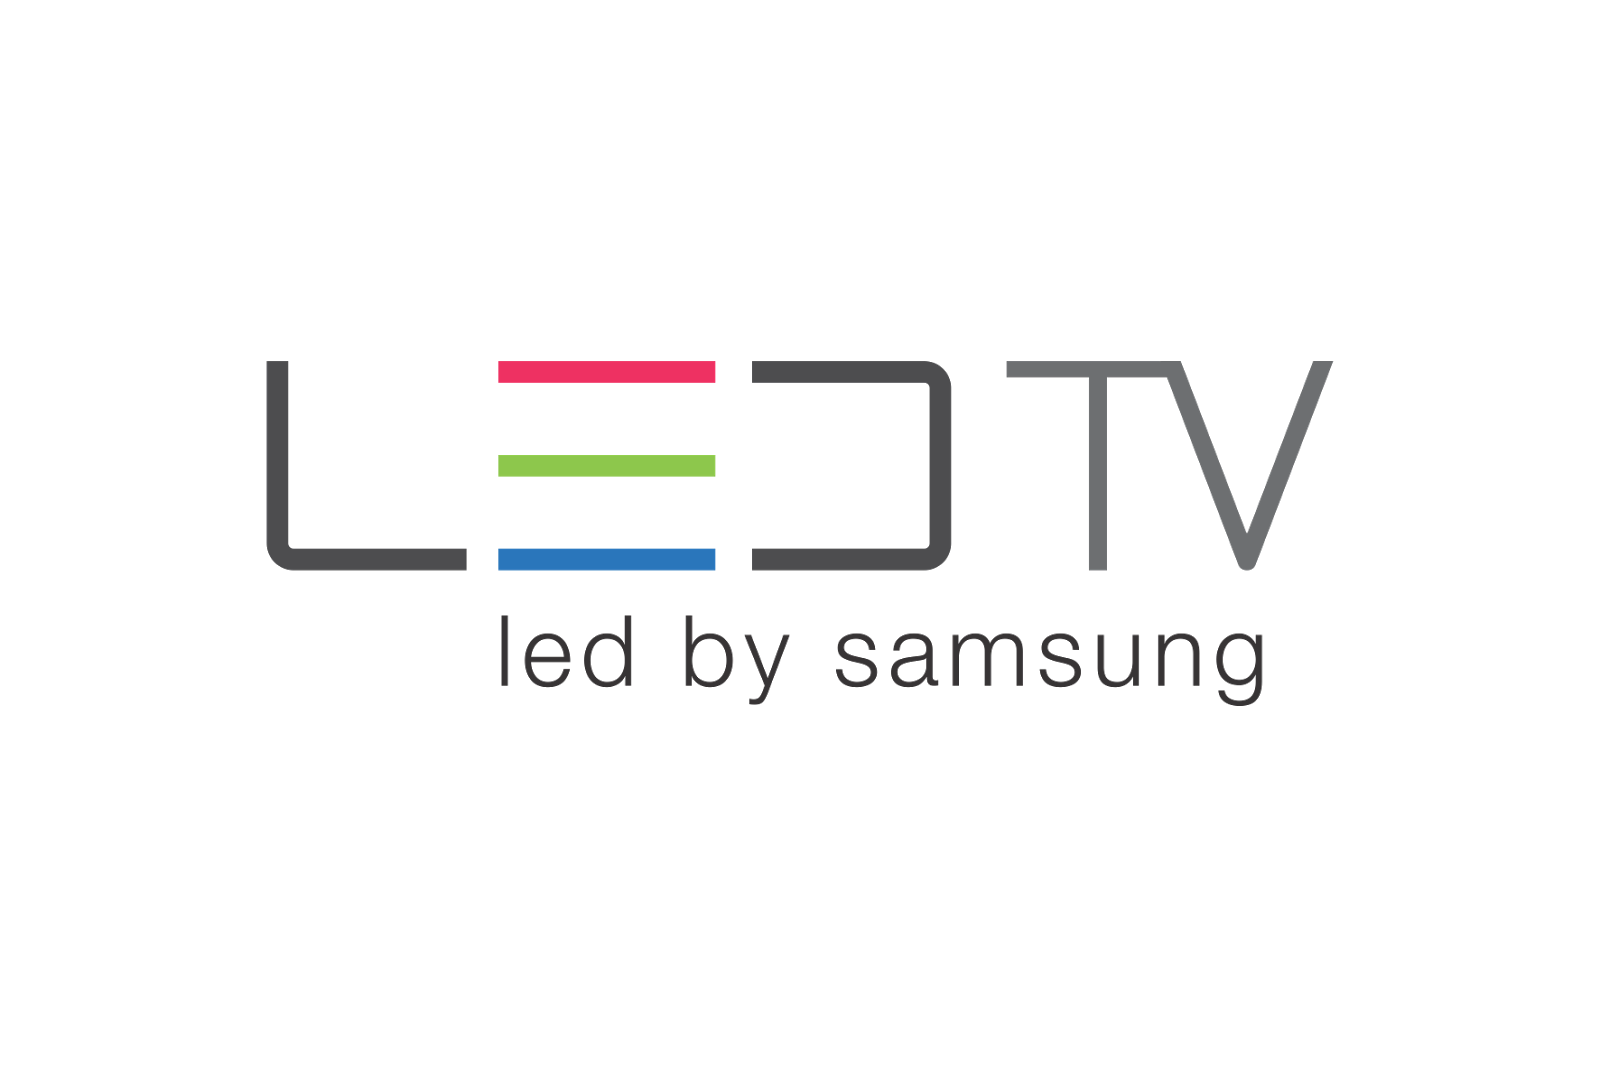 Led Tv By Samsung Logo